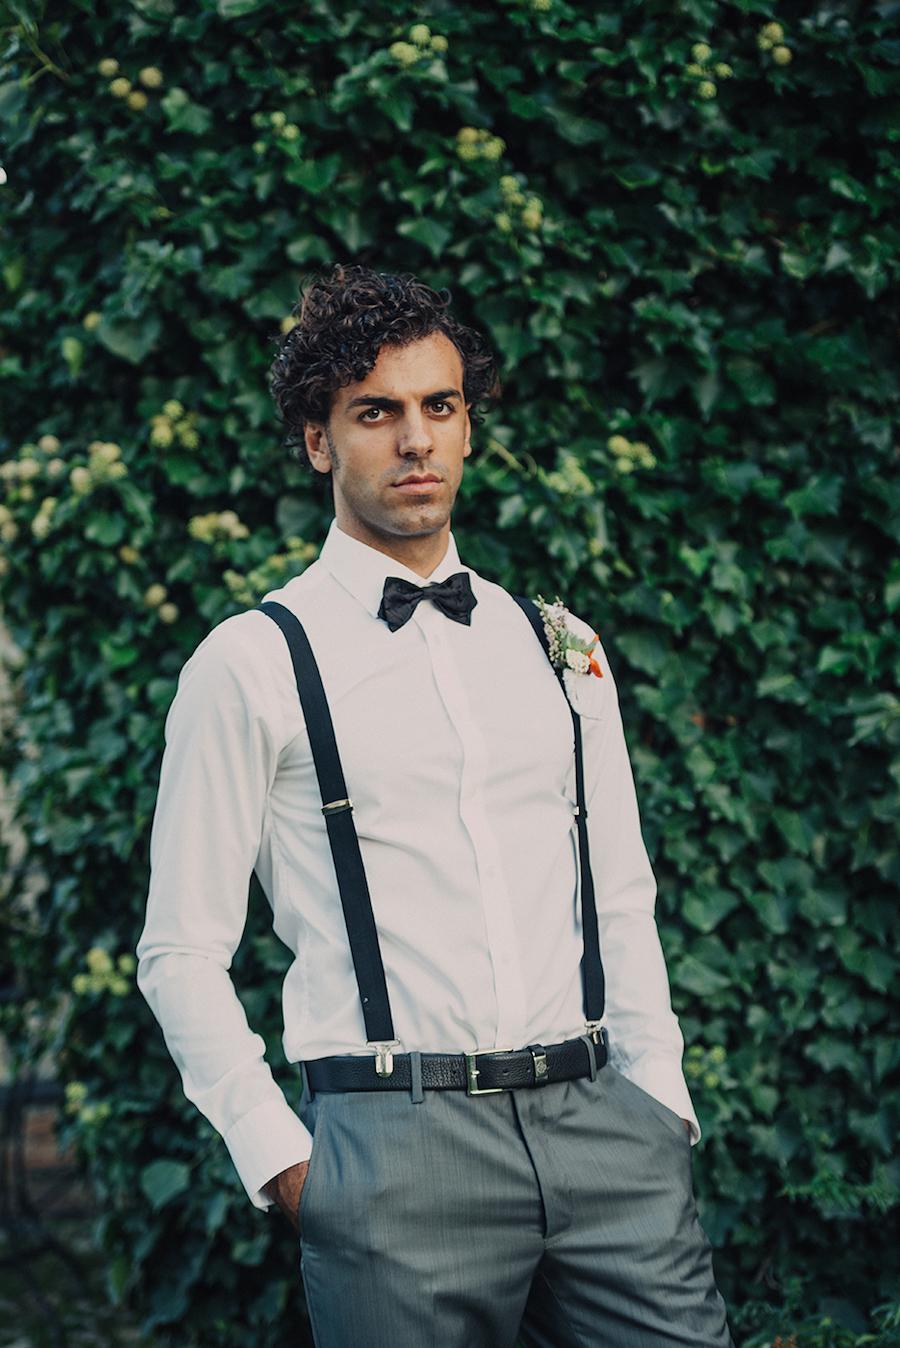 matrimonio-bucolico-boho-chic-gradisca-portento-wedding-wonderland-20